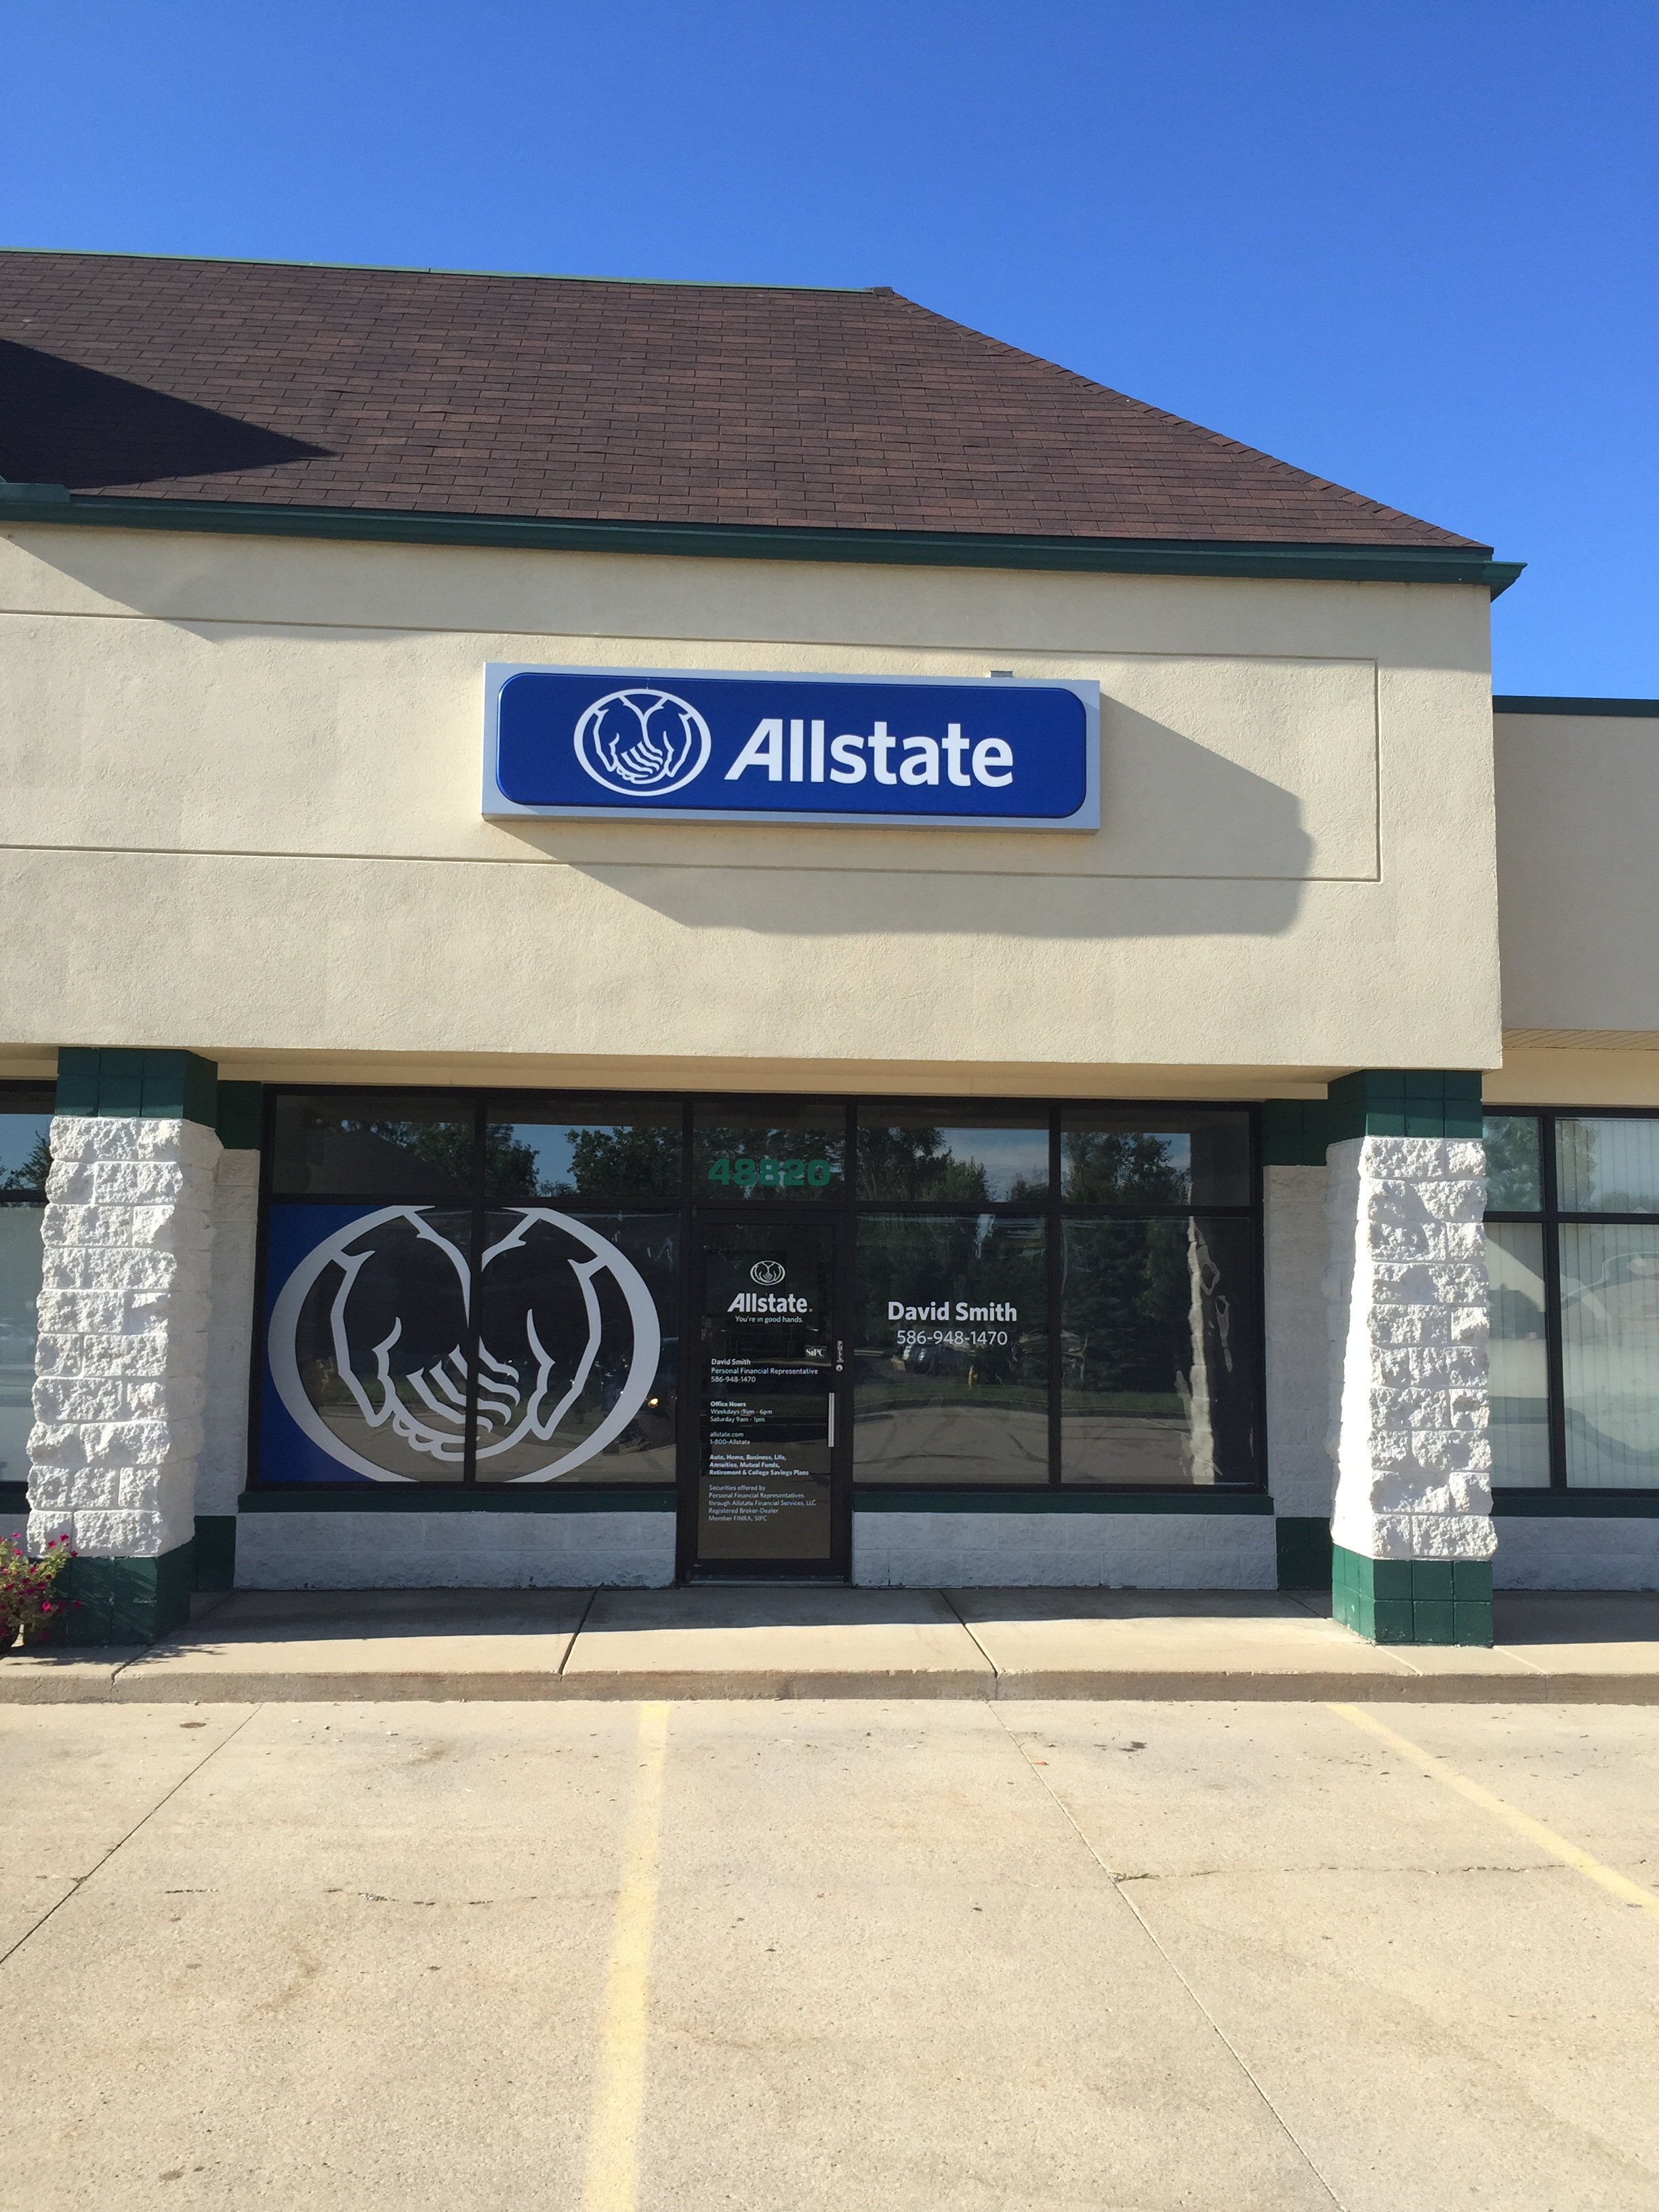 David Smith Allstate Insurance 48820 Gratiot Ave Chesterfield Mi